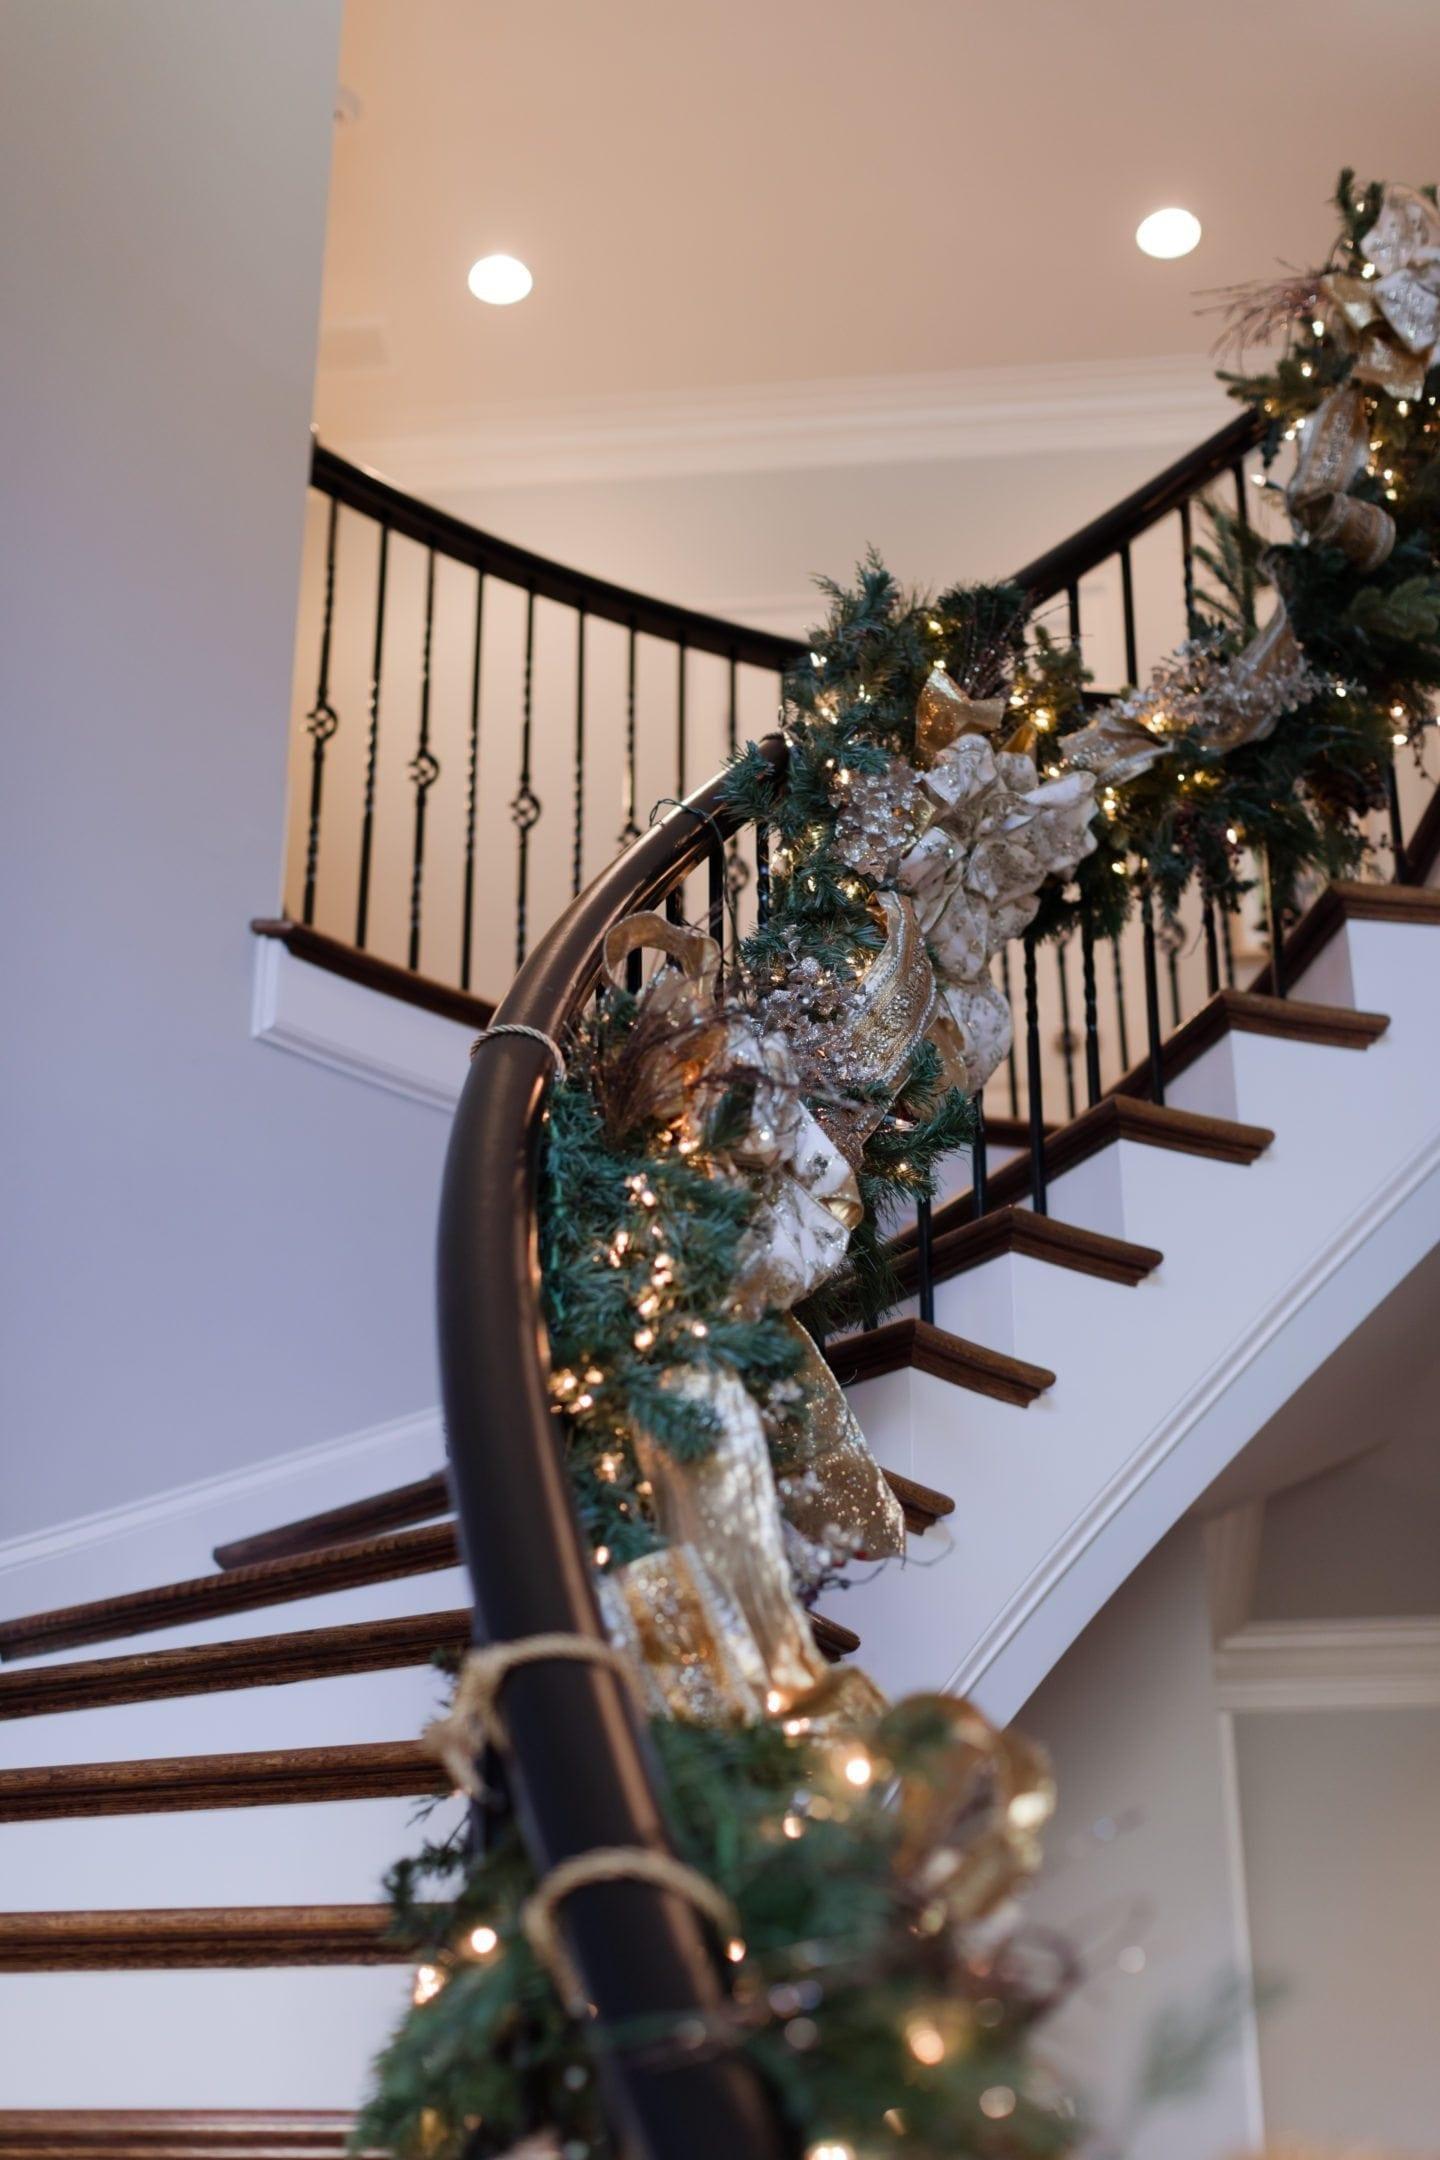 House Christmas decoration. Tips to hang garland on a banister. Christmas staircase inspiration.